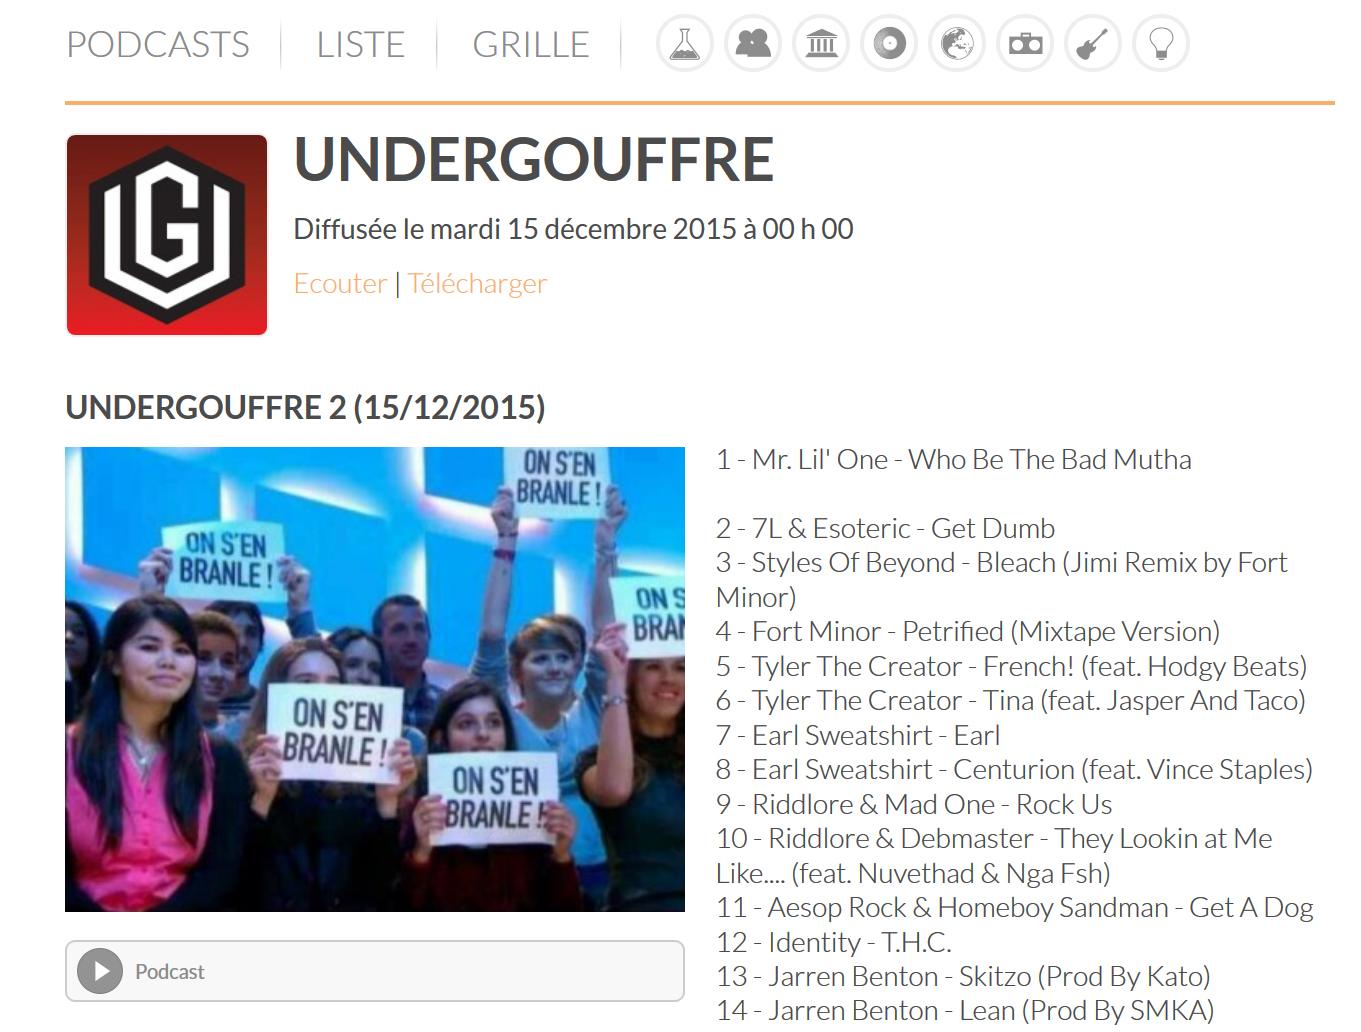 undergouffre-radioprun